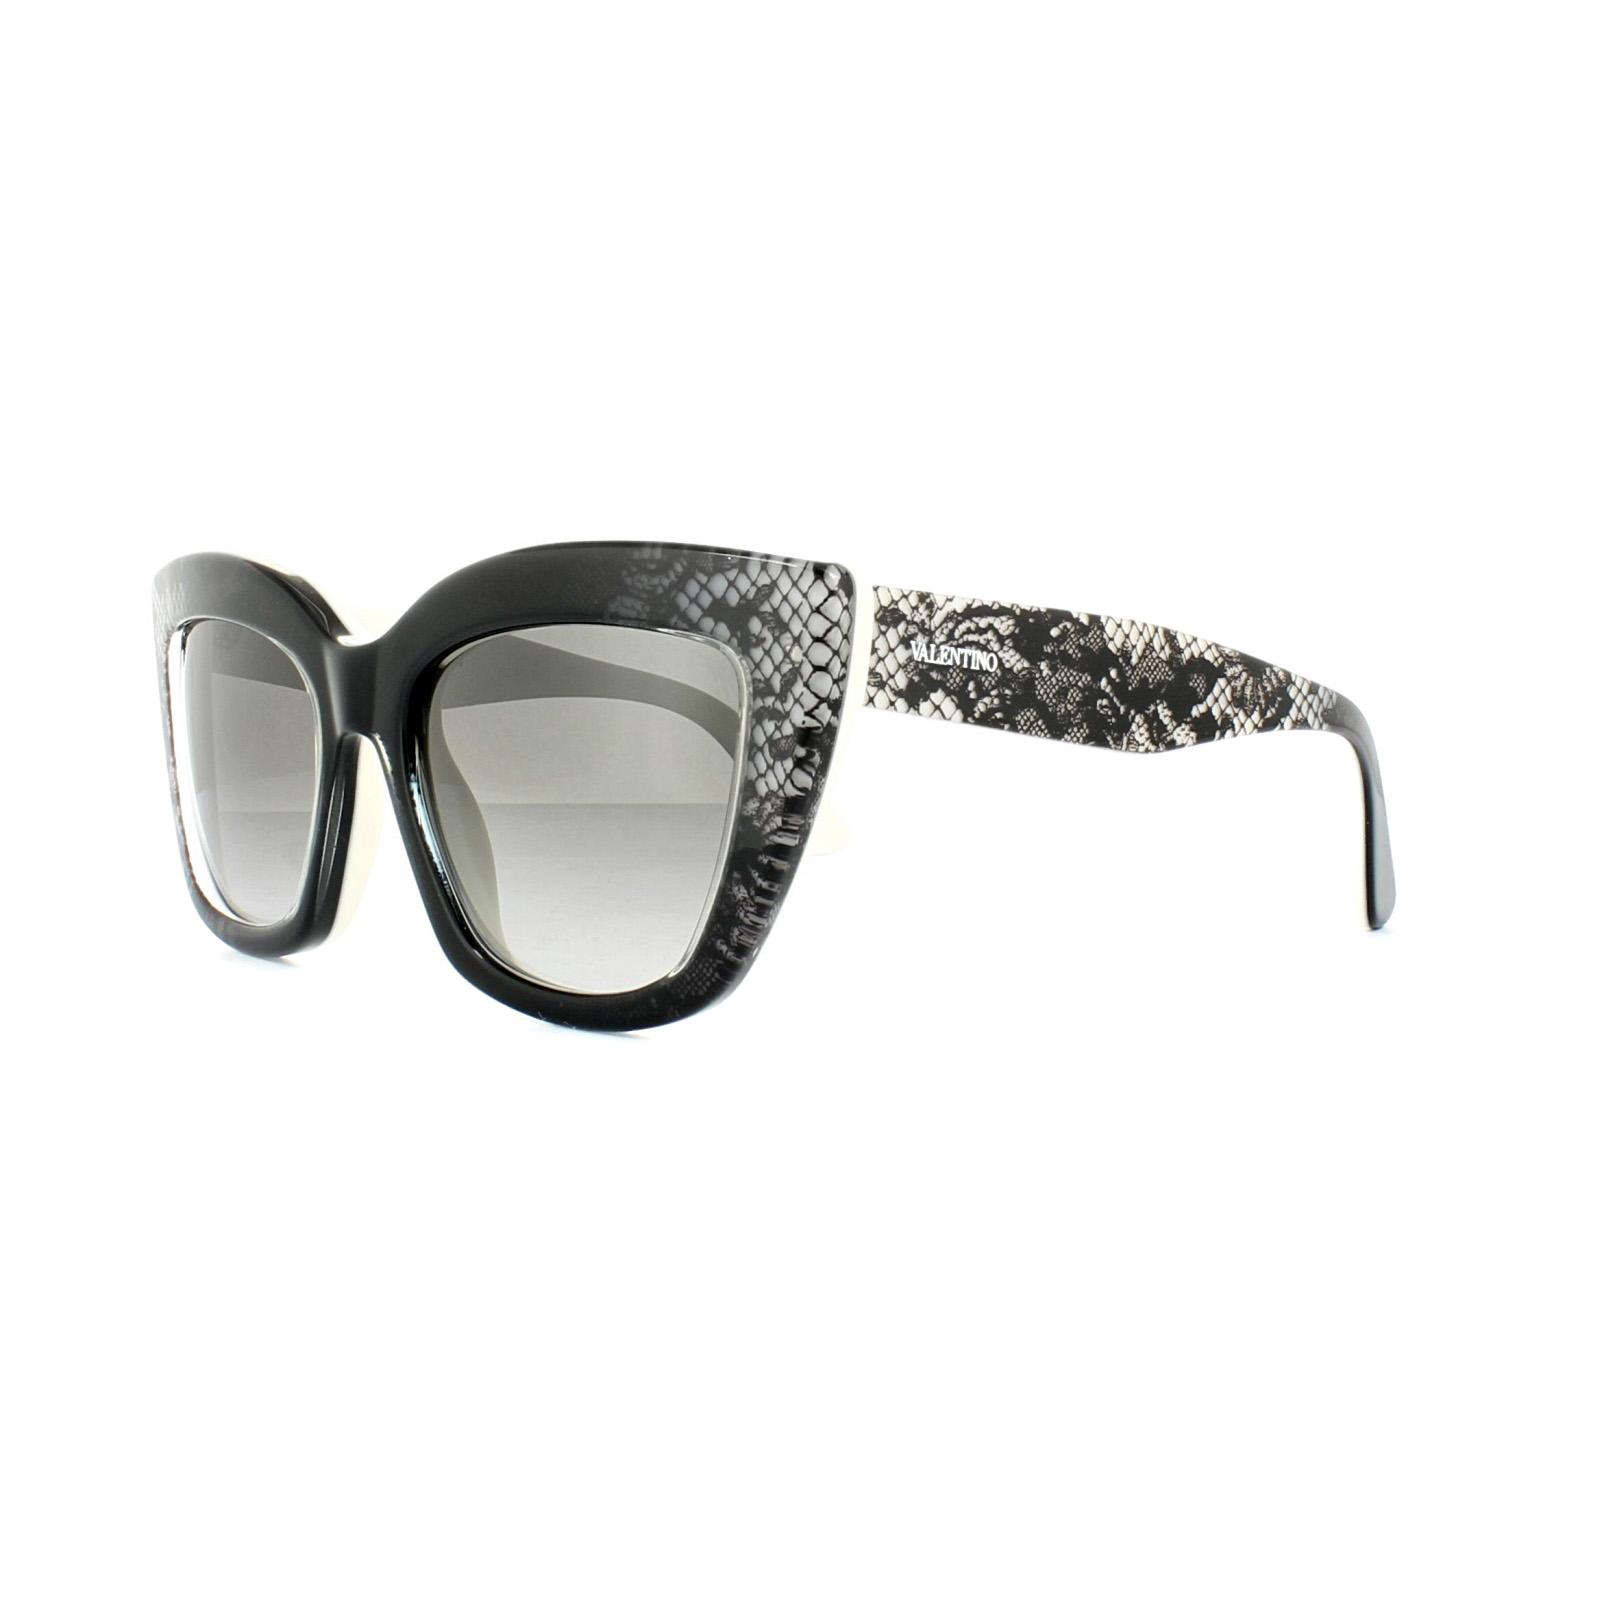 b1cda5b7d0d5a Cheap Valentino V710S Sunglasses - Discounted Sunglasses